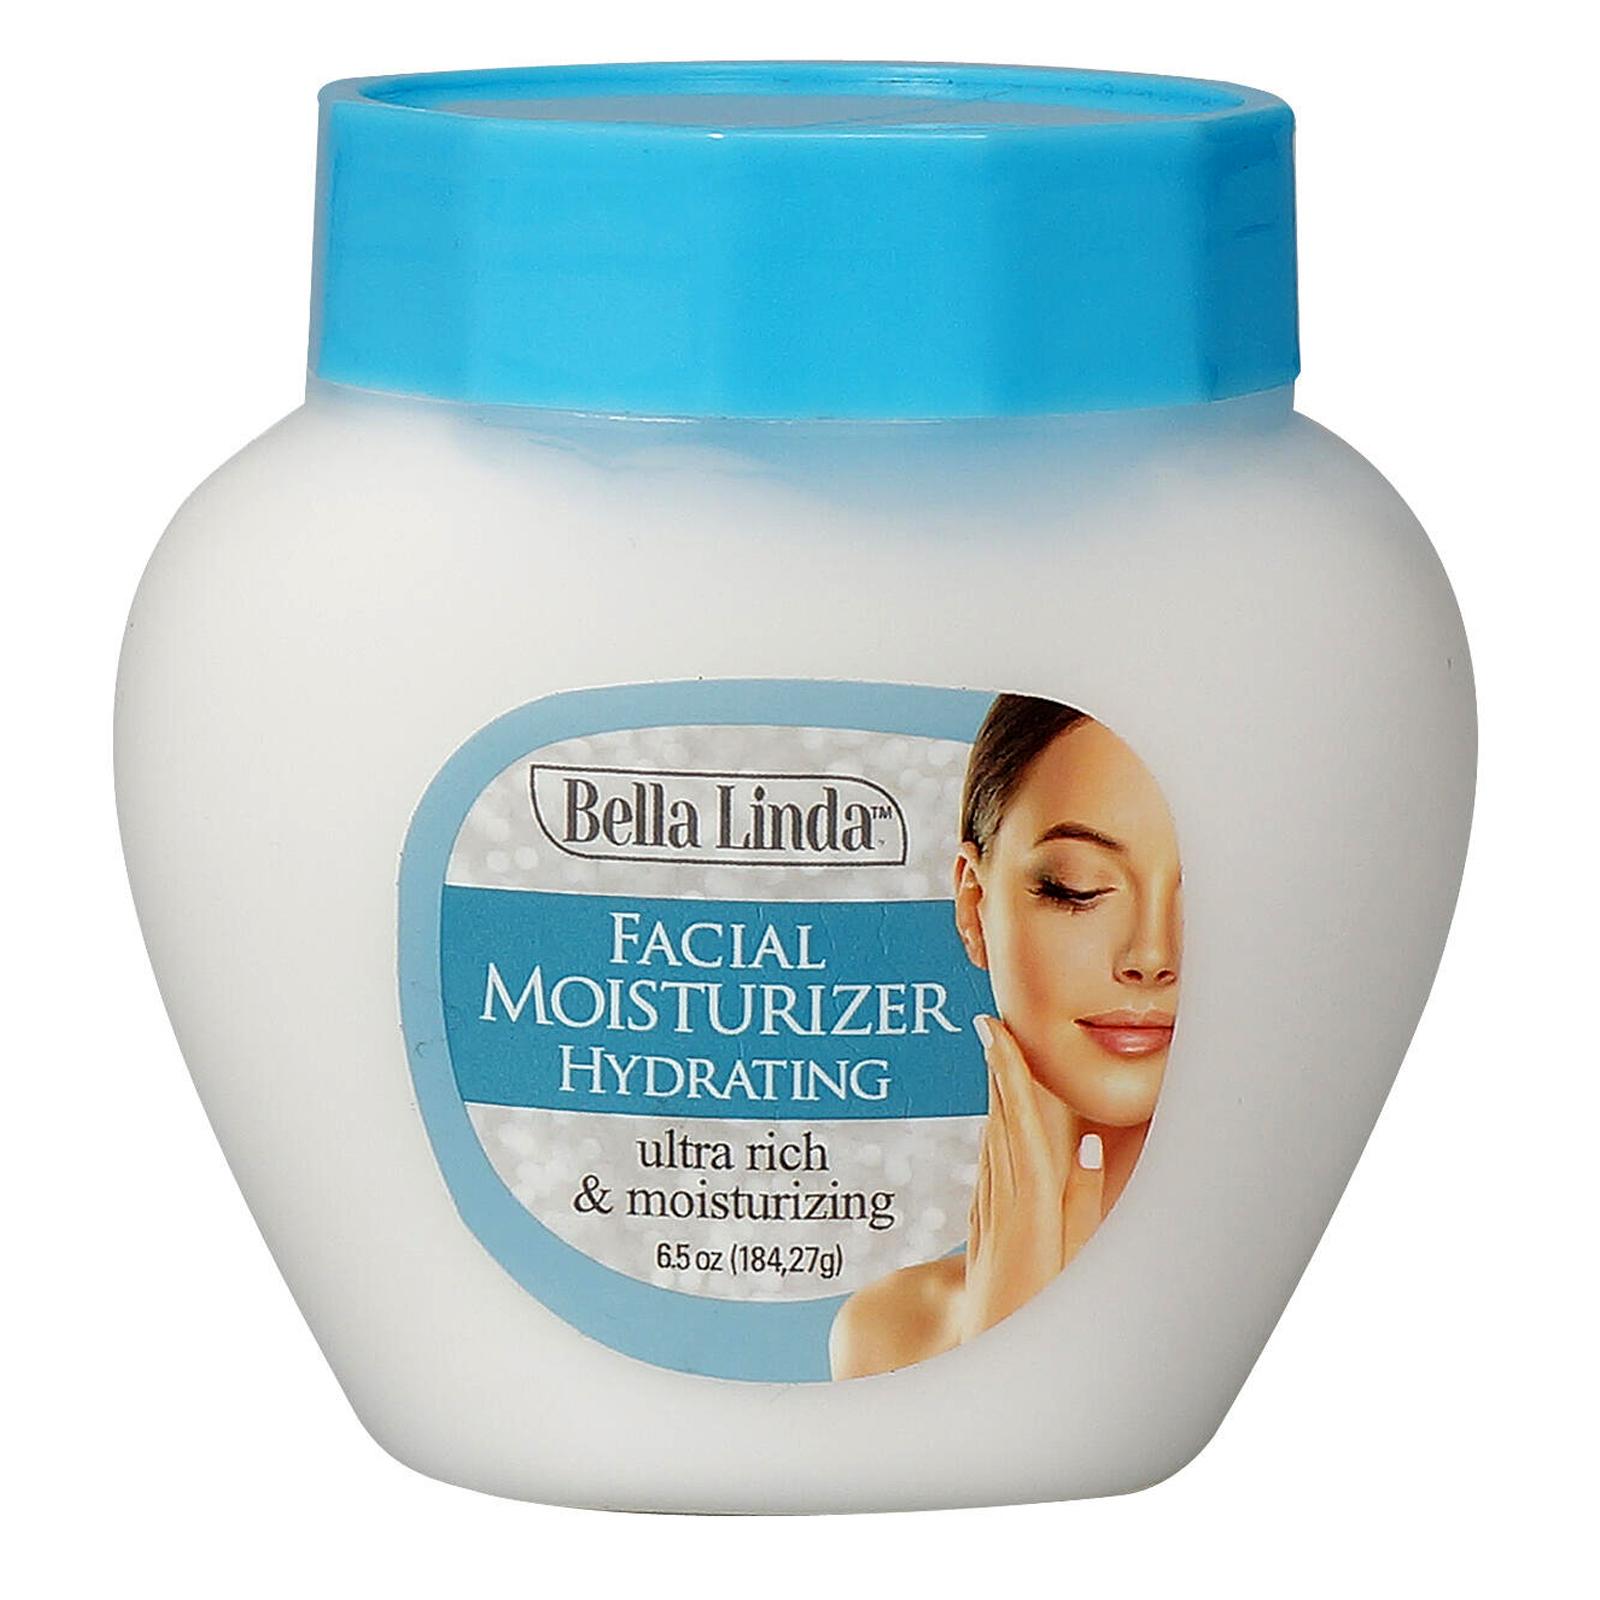 Bella Linda Skin Care Face Moisturizer Cream Lotion 6.5oz